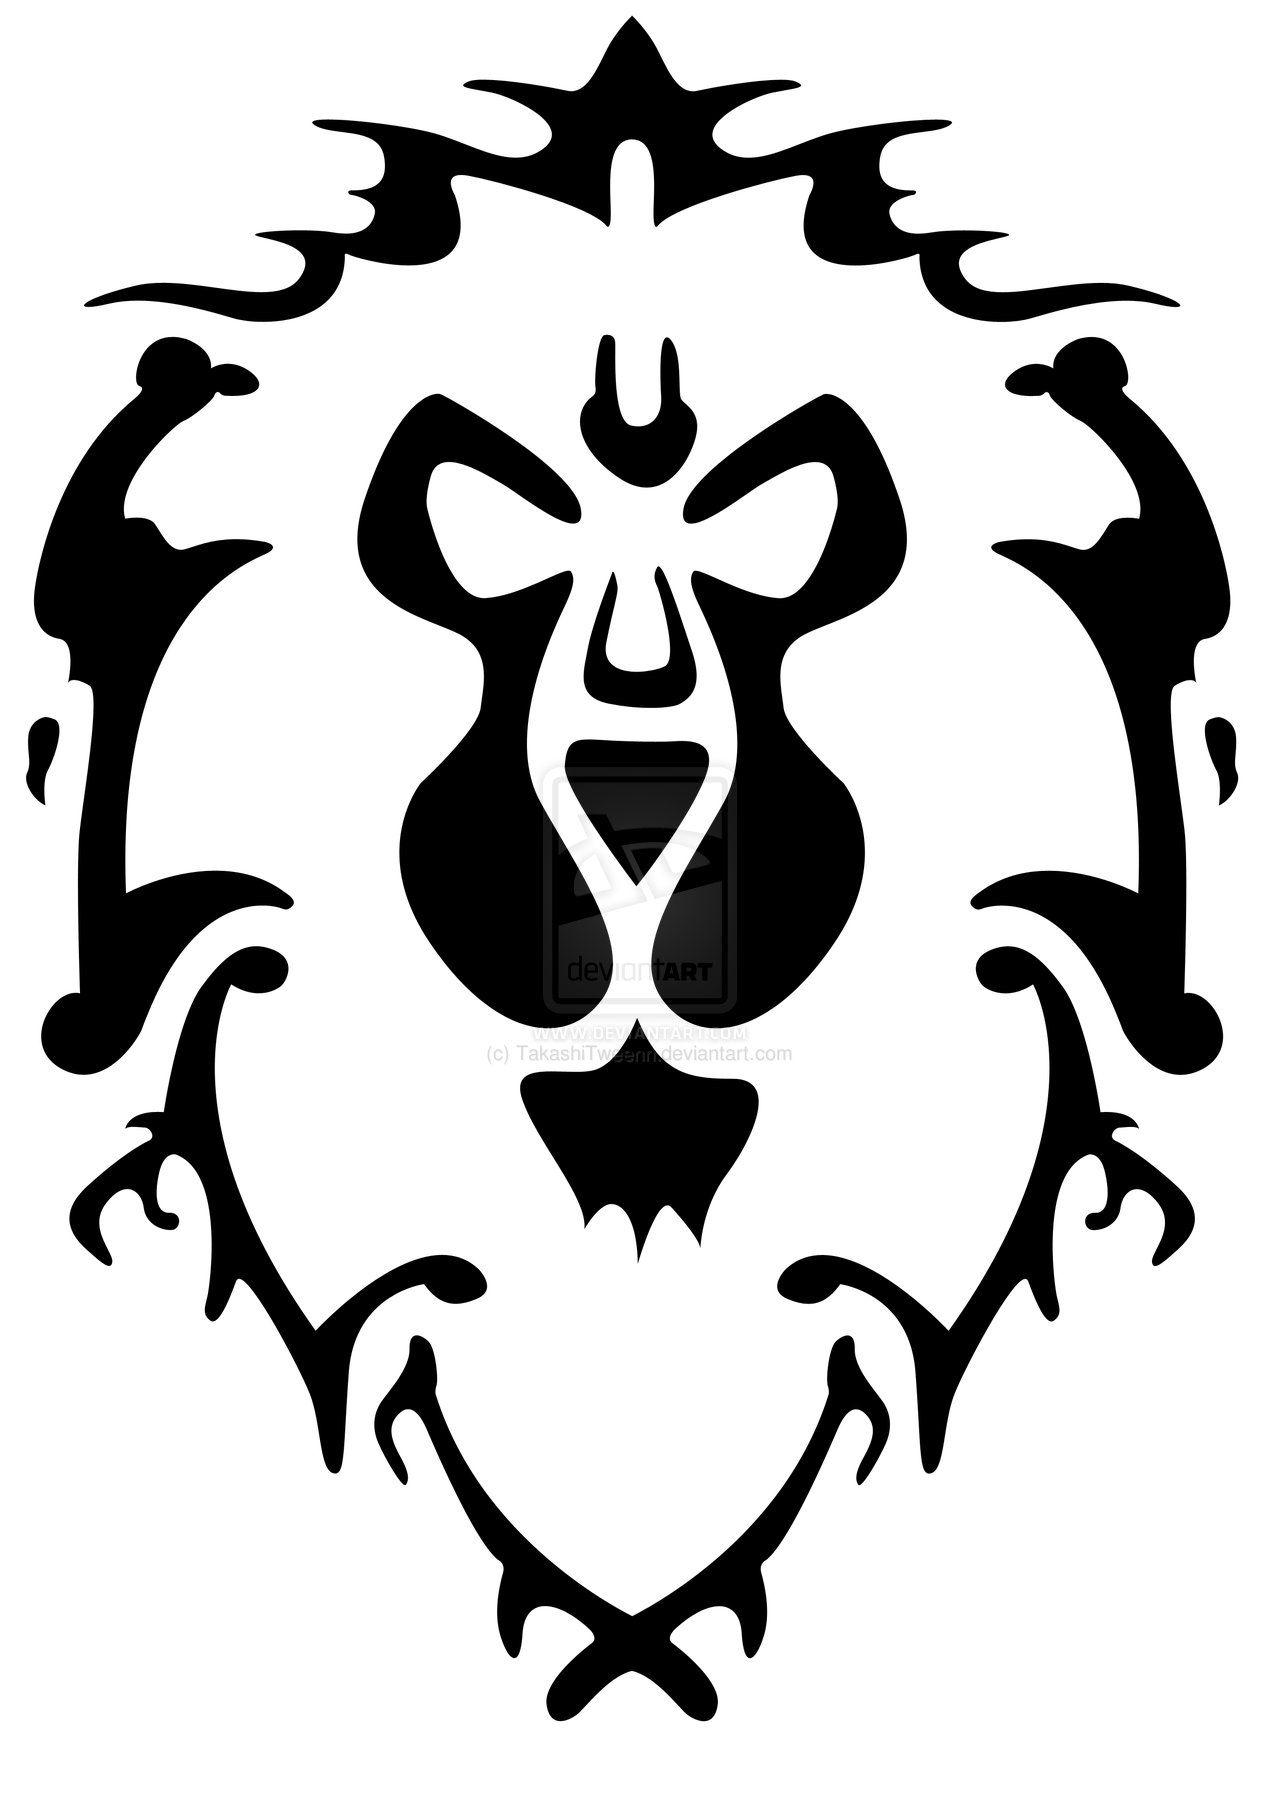 1280x1811 Warcraft Alliance Logo Vector Wow Alliance Kk Logos In 2018